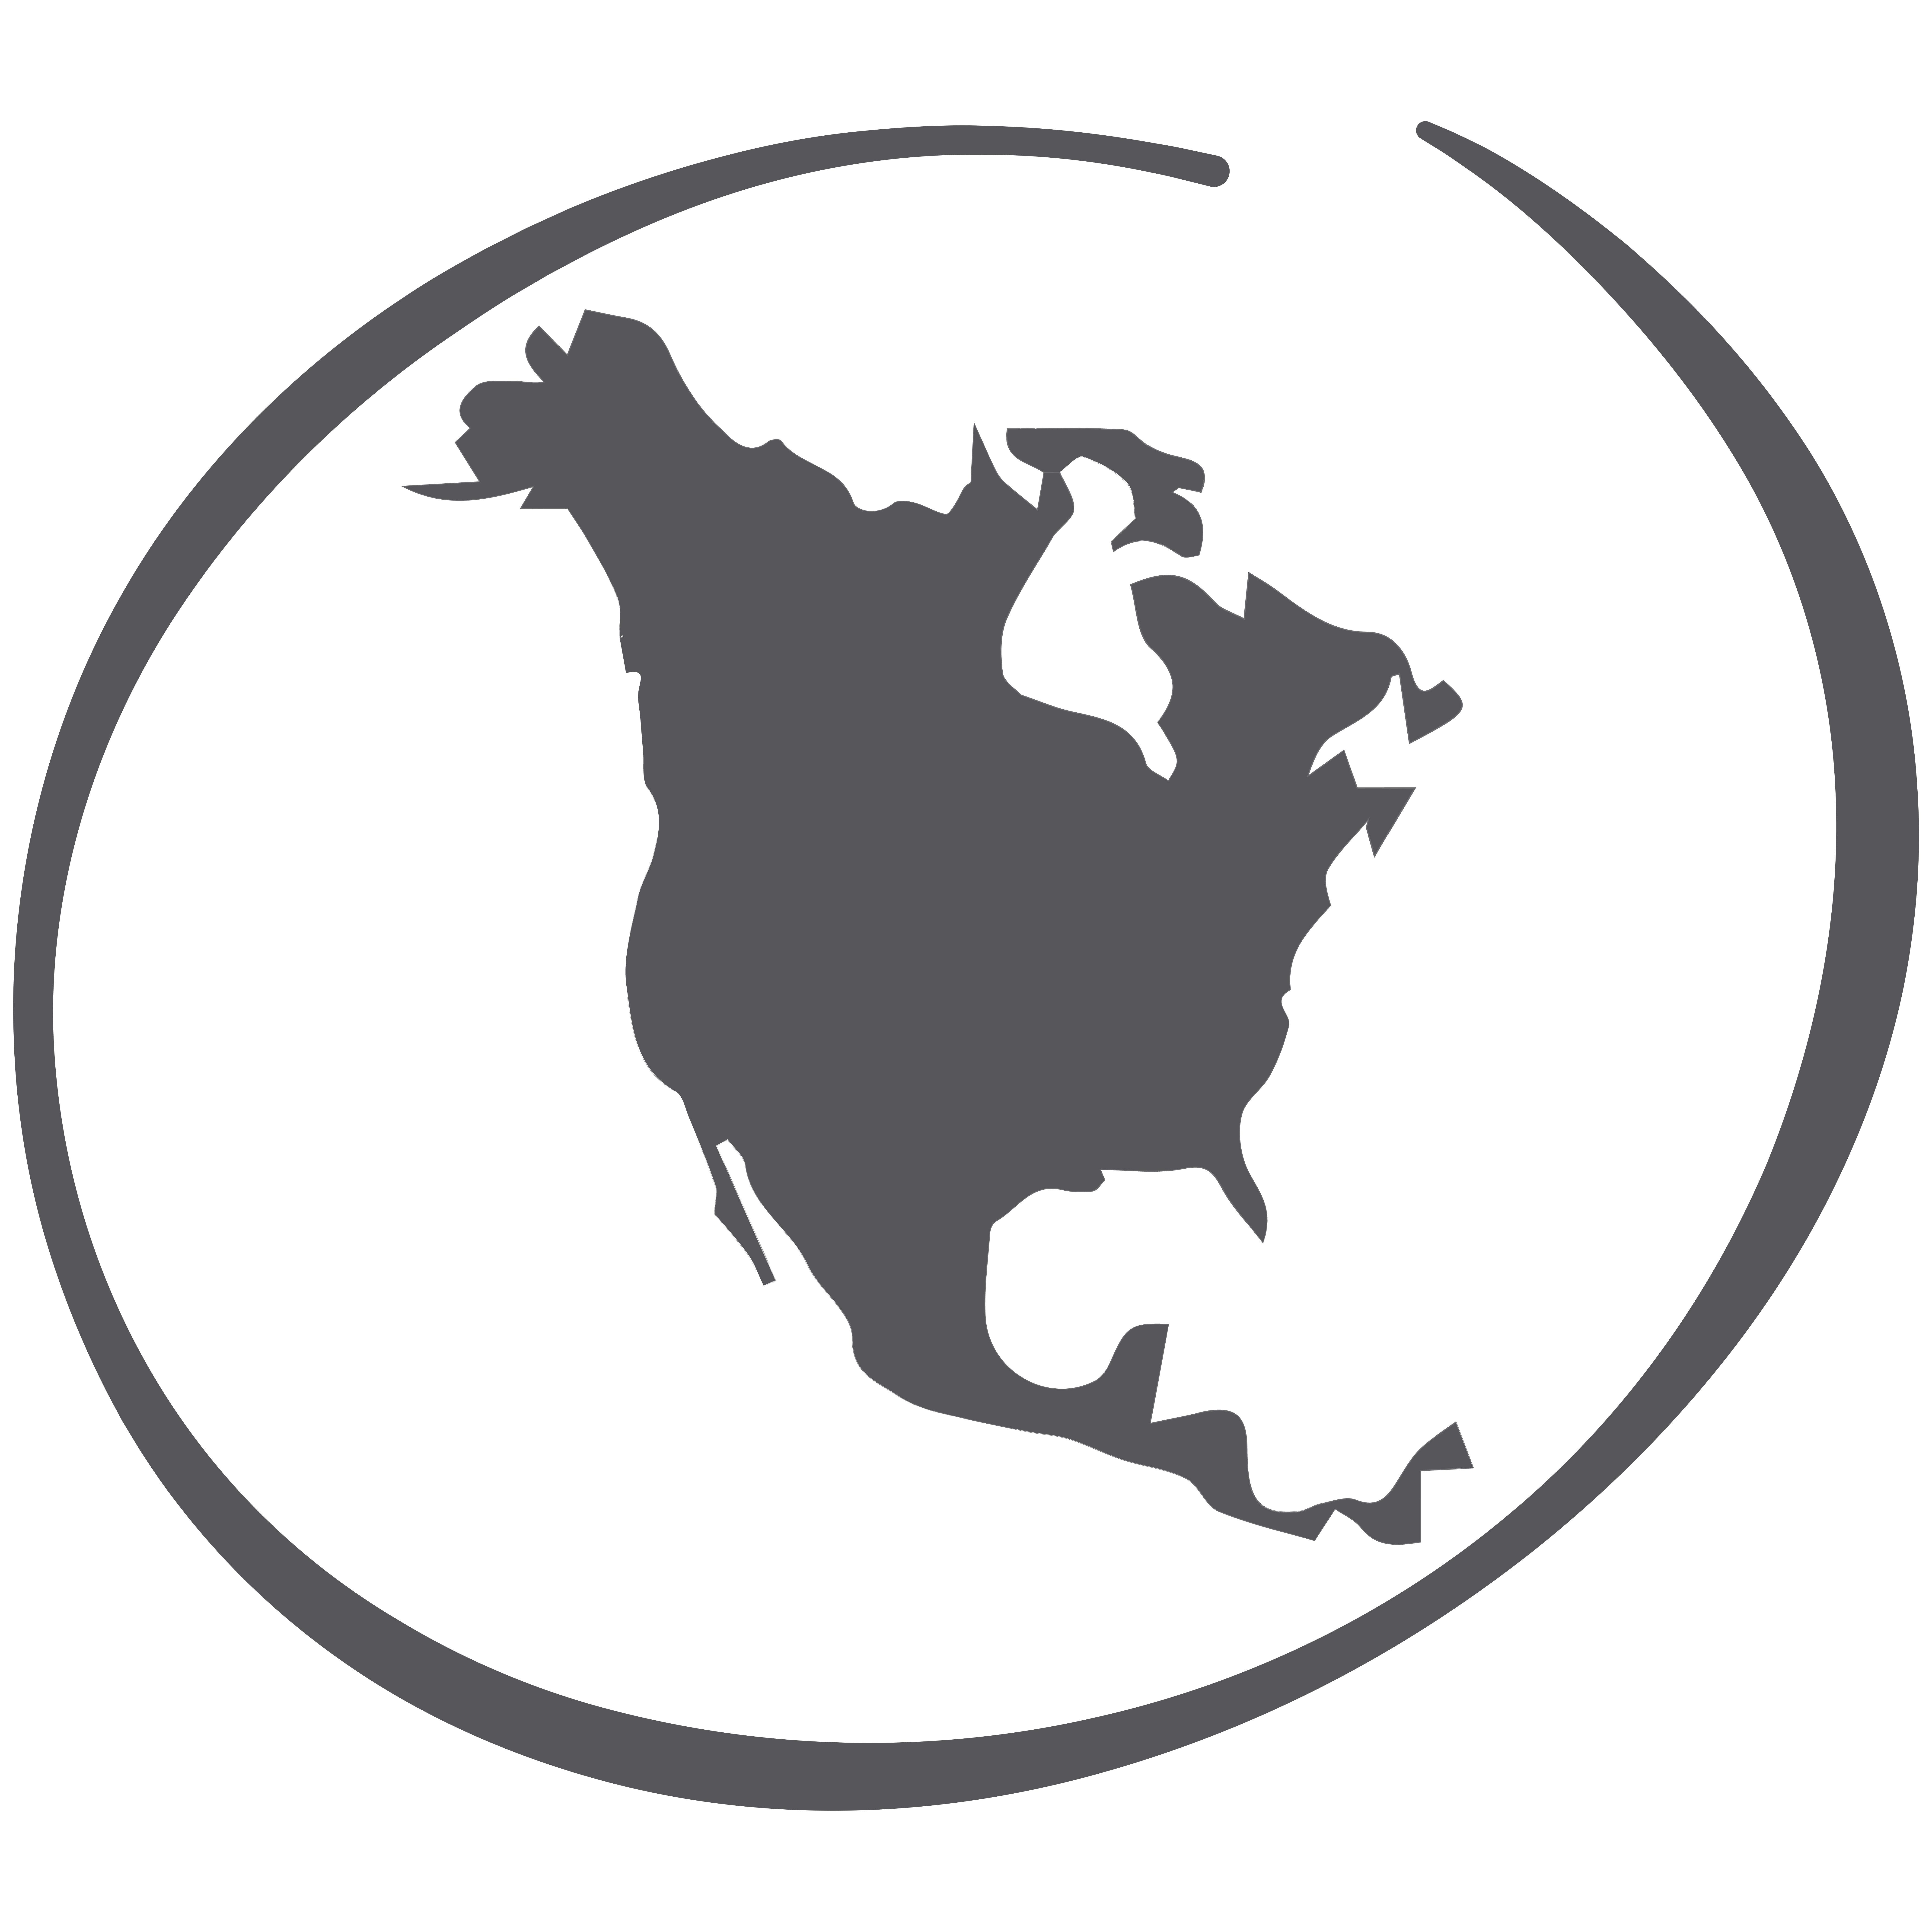 North American Manufacturer